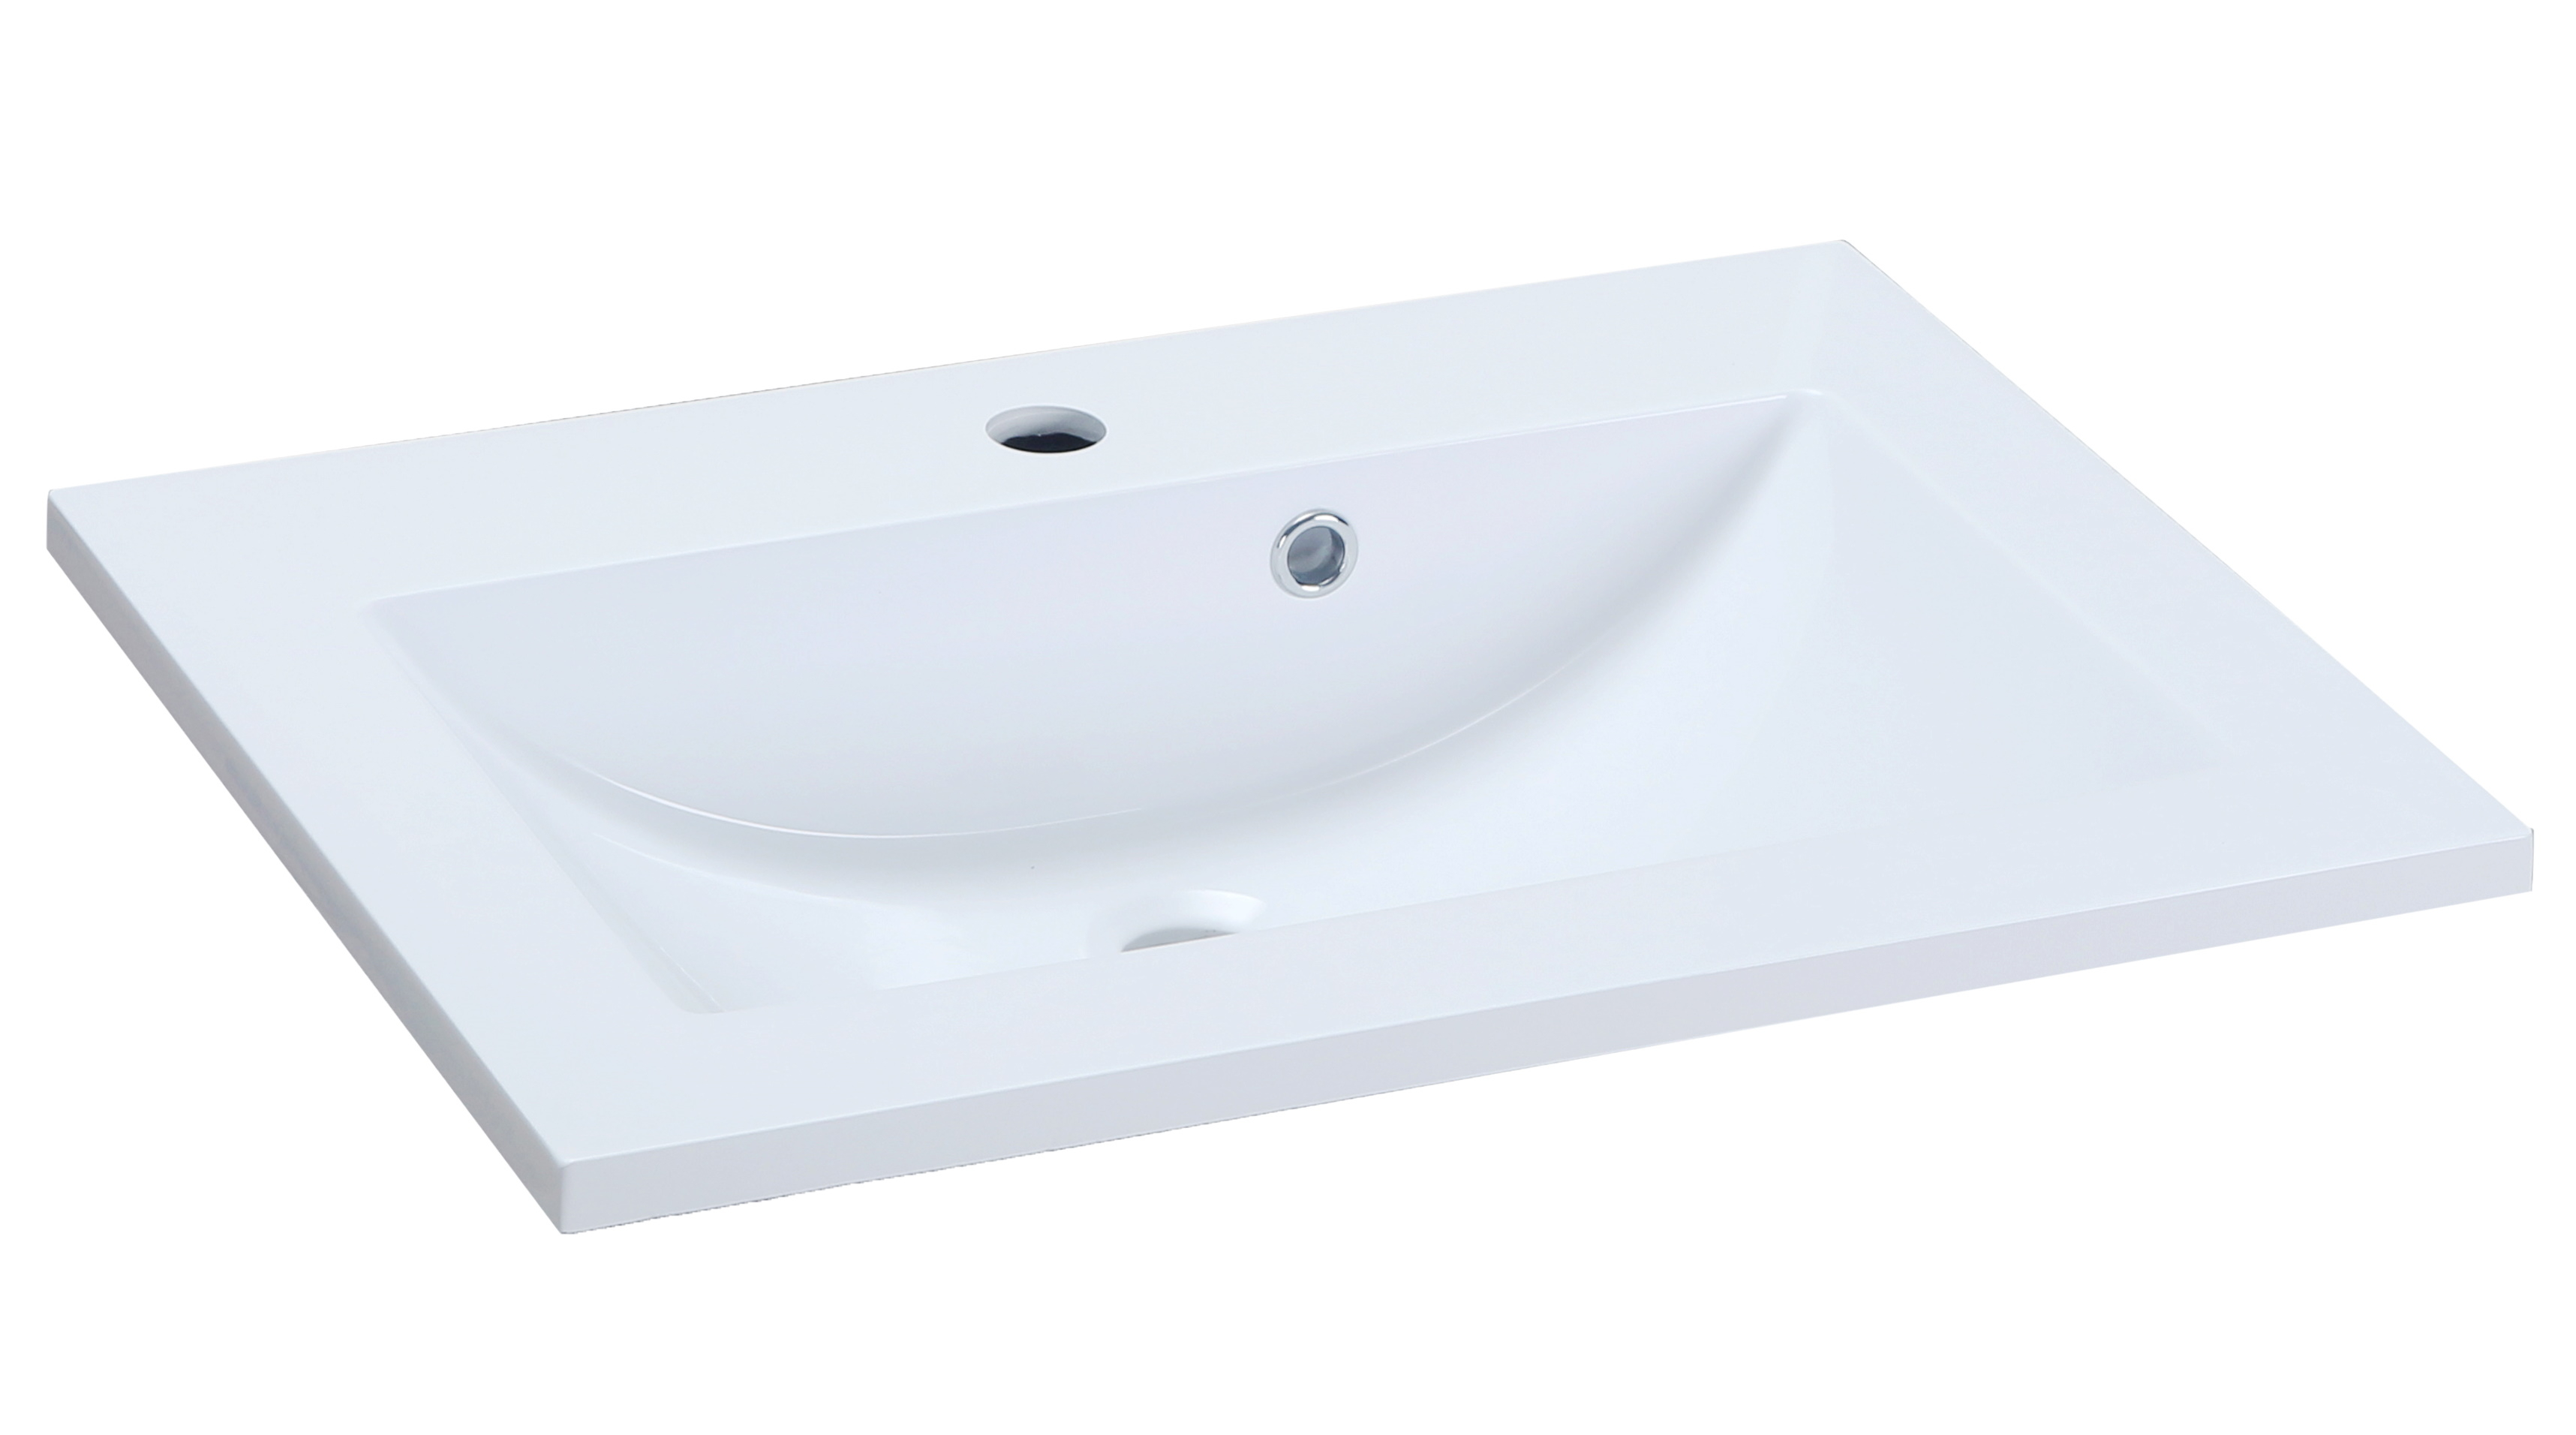 Lavoar Sanotechnik Soho 80x46cm montare pe mobilier compozit alb poza